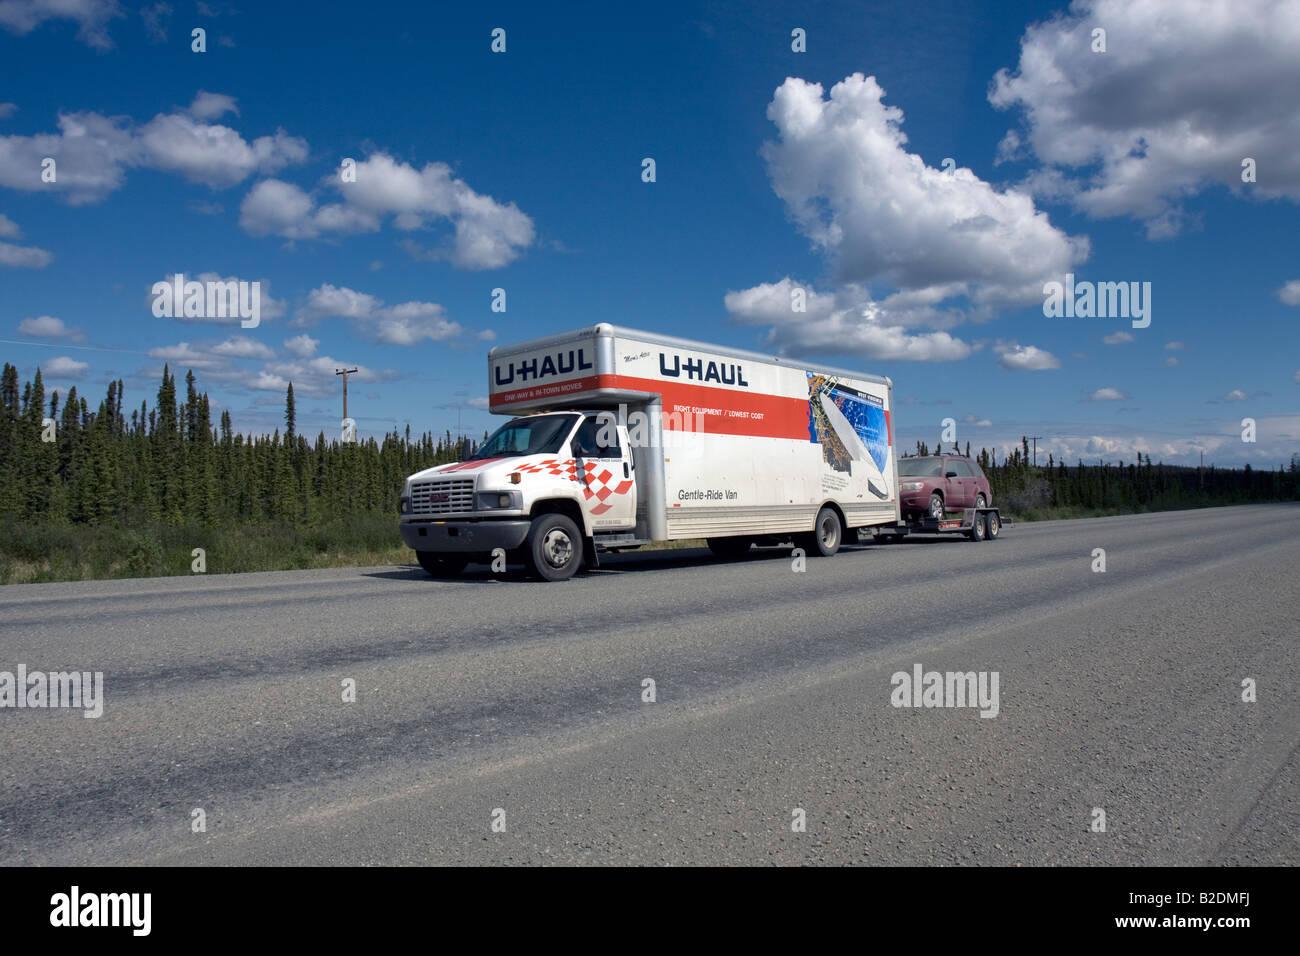 U-haul van on the move in Alaska, Northern America, United States of America Stock Photo